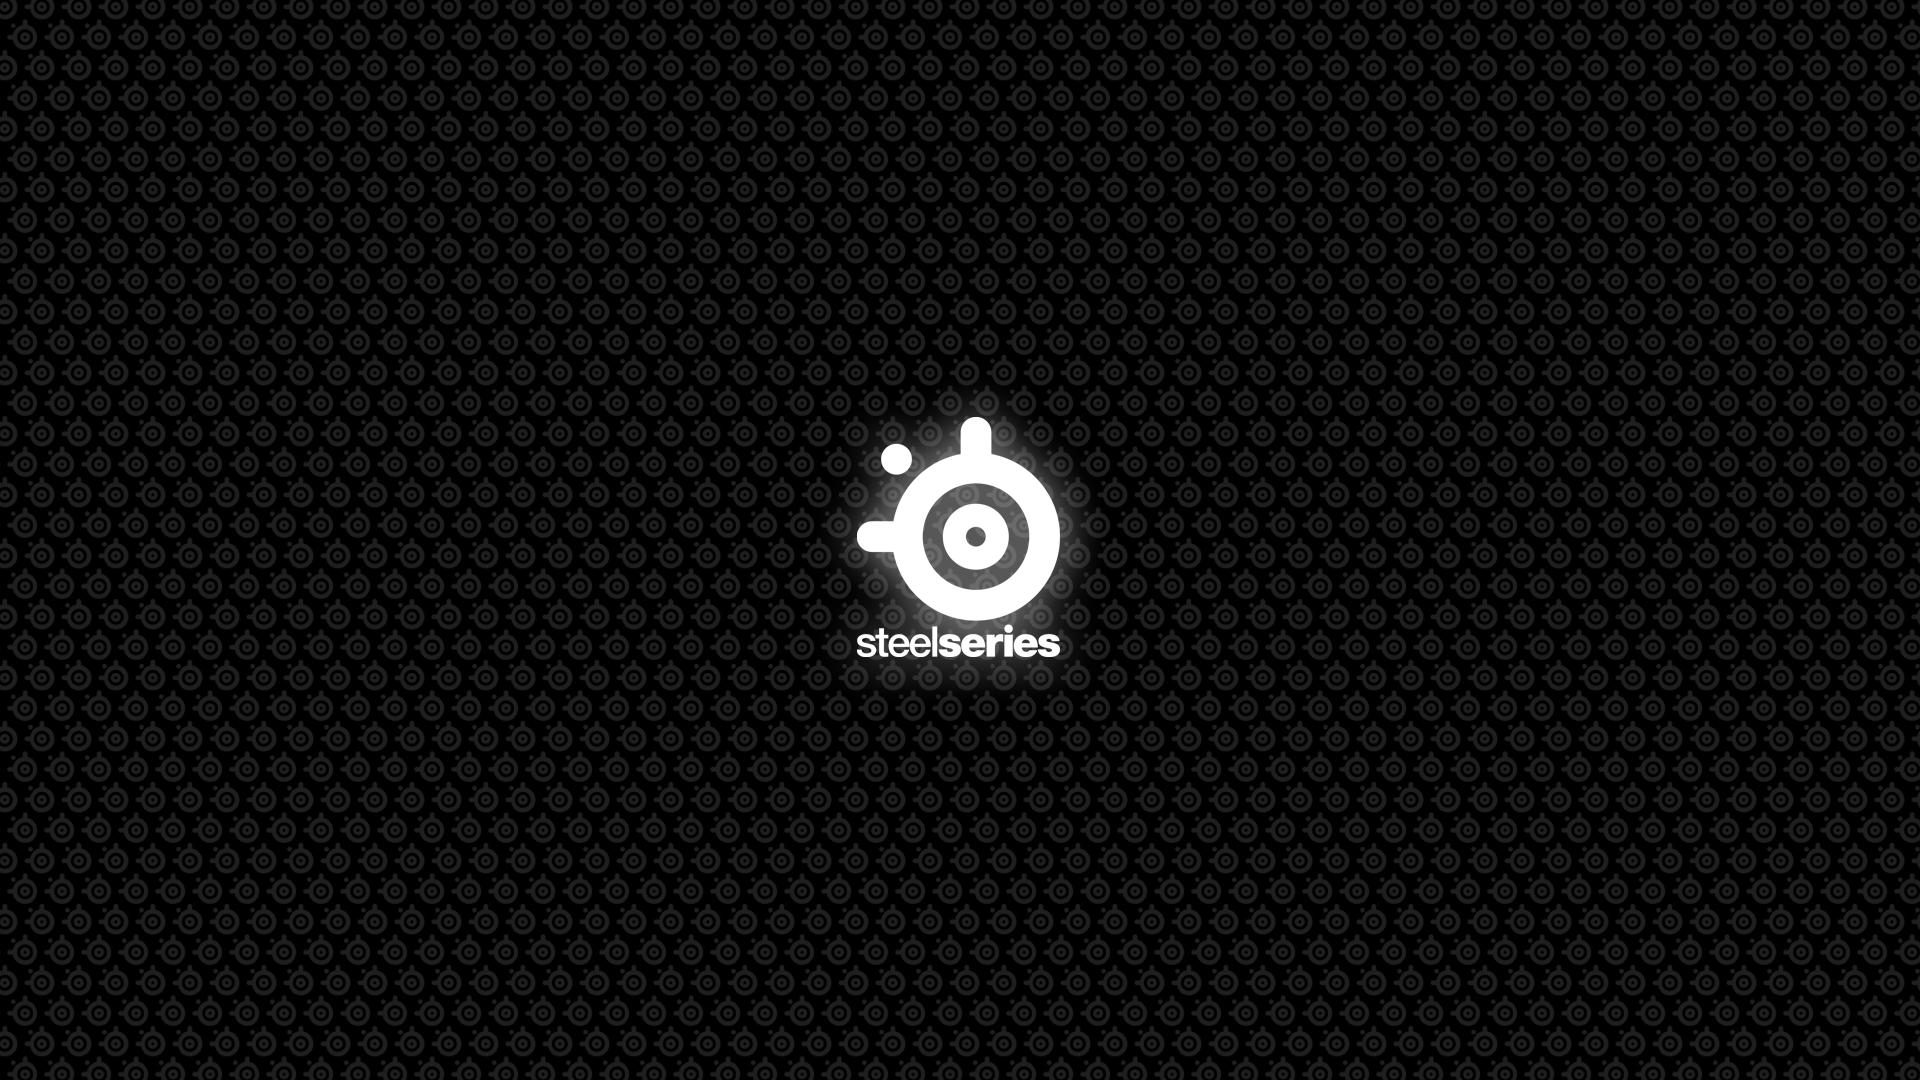 Alienware Logo Hd Wallpaper Steelseries Wallpapers Wallpaper Cave